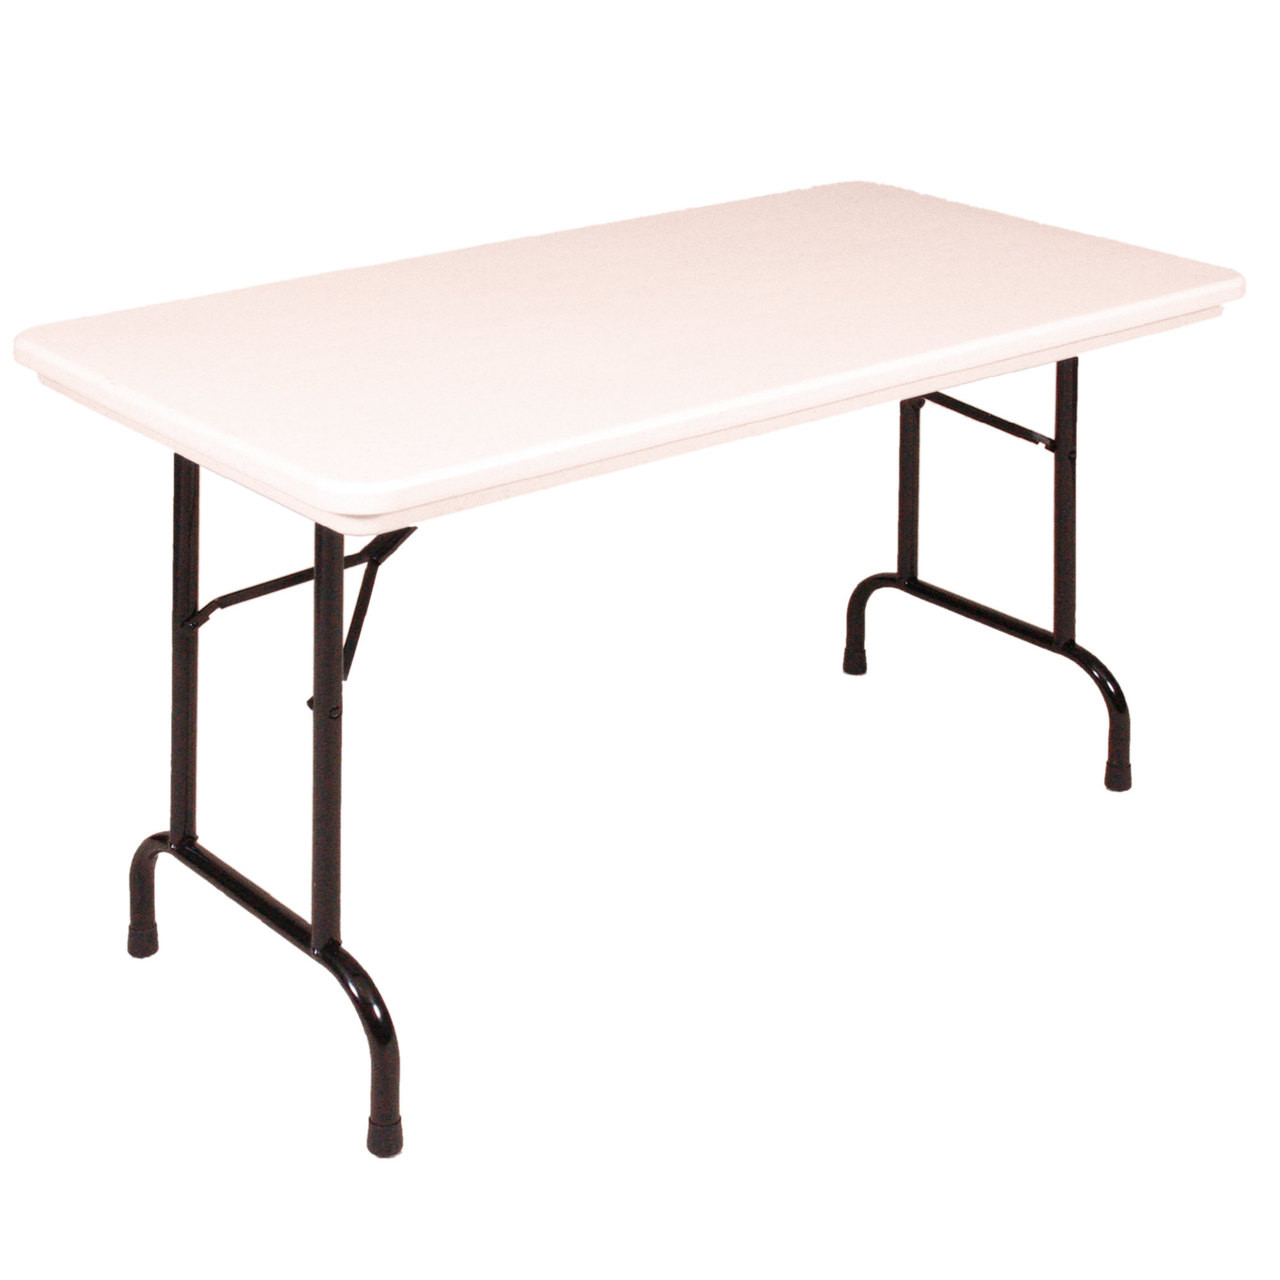 30 X 60 Folding Table.Correll Ra3060 23 Heavy Duty Plastic Folding Table Gray Granite 30 W X 60 L Adjustable Height